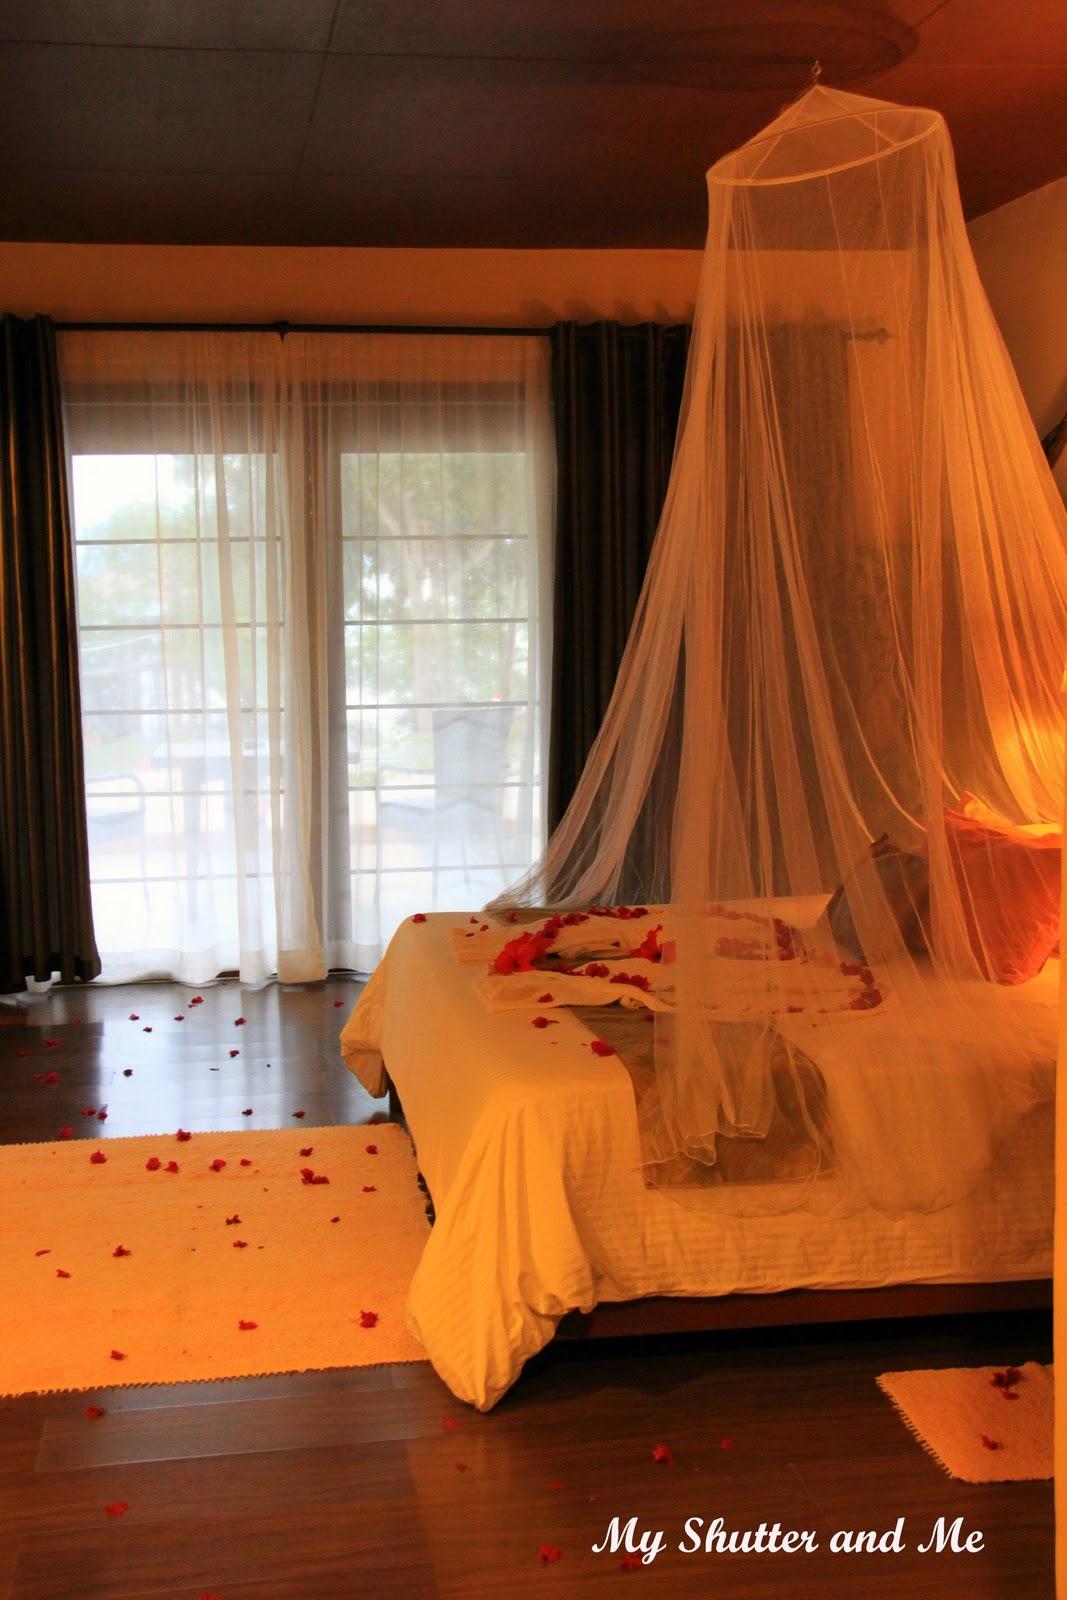 Romantic Hotel Room Ideas: Wedding Night Hotel Room Decorations